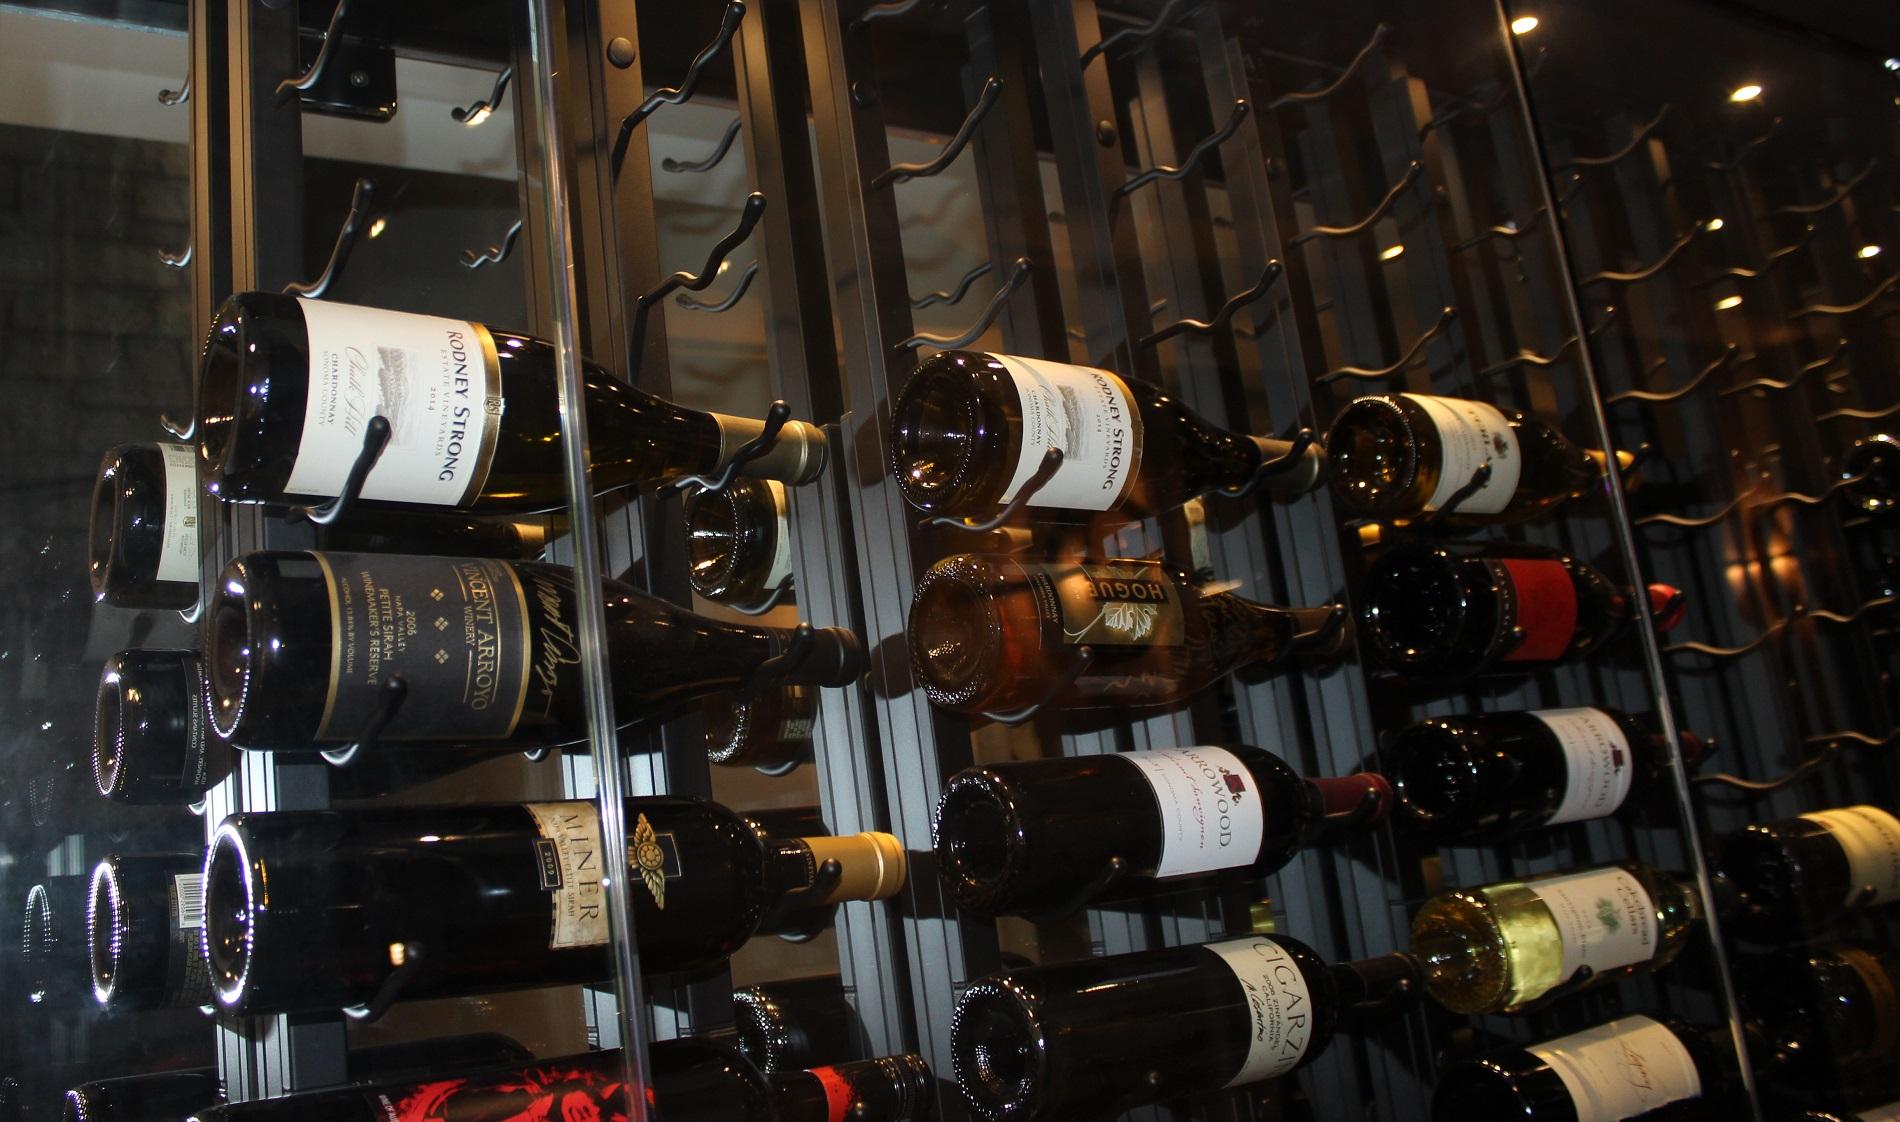 VanV wine closet.jpg